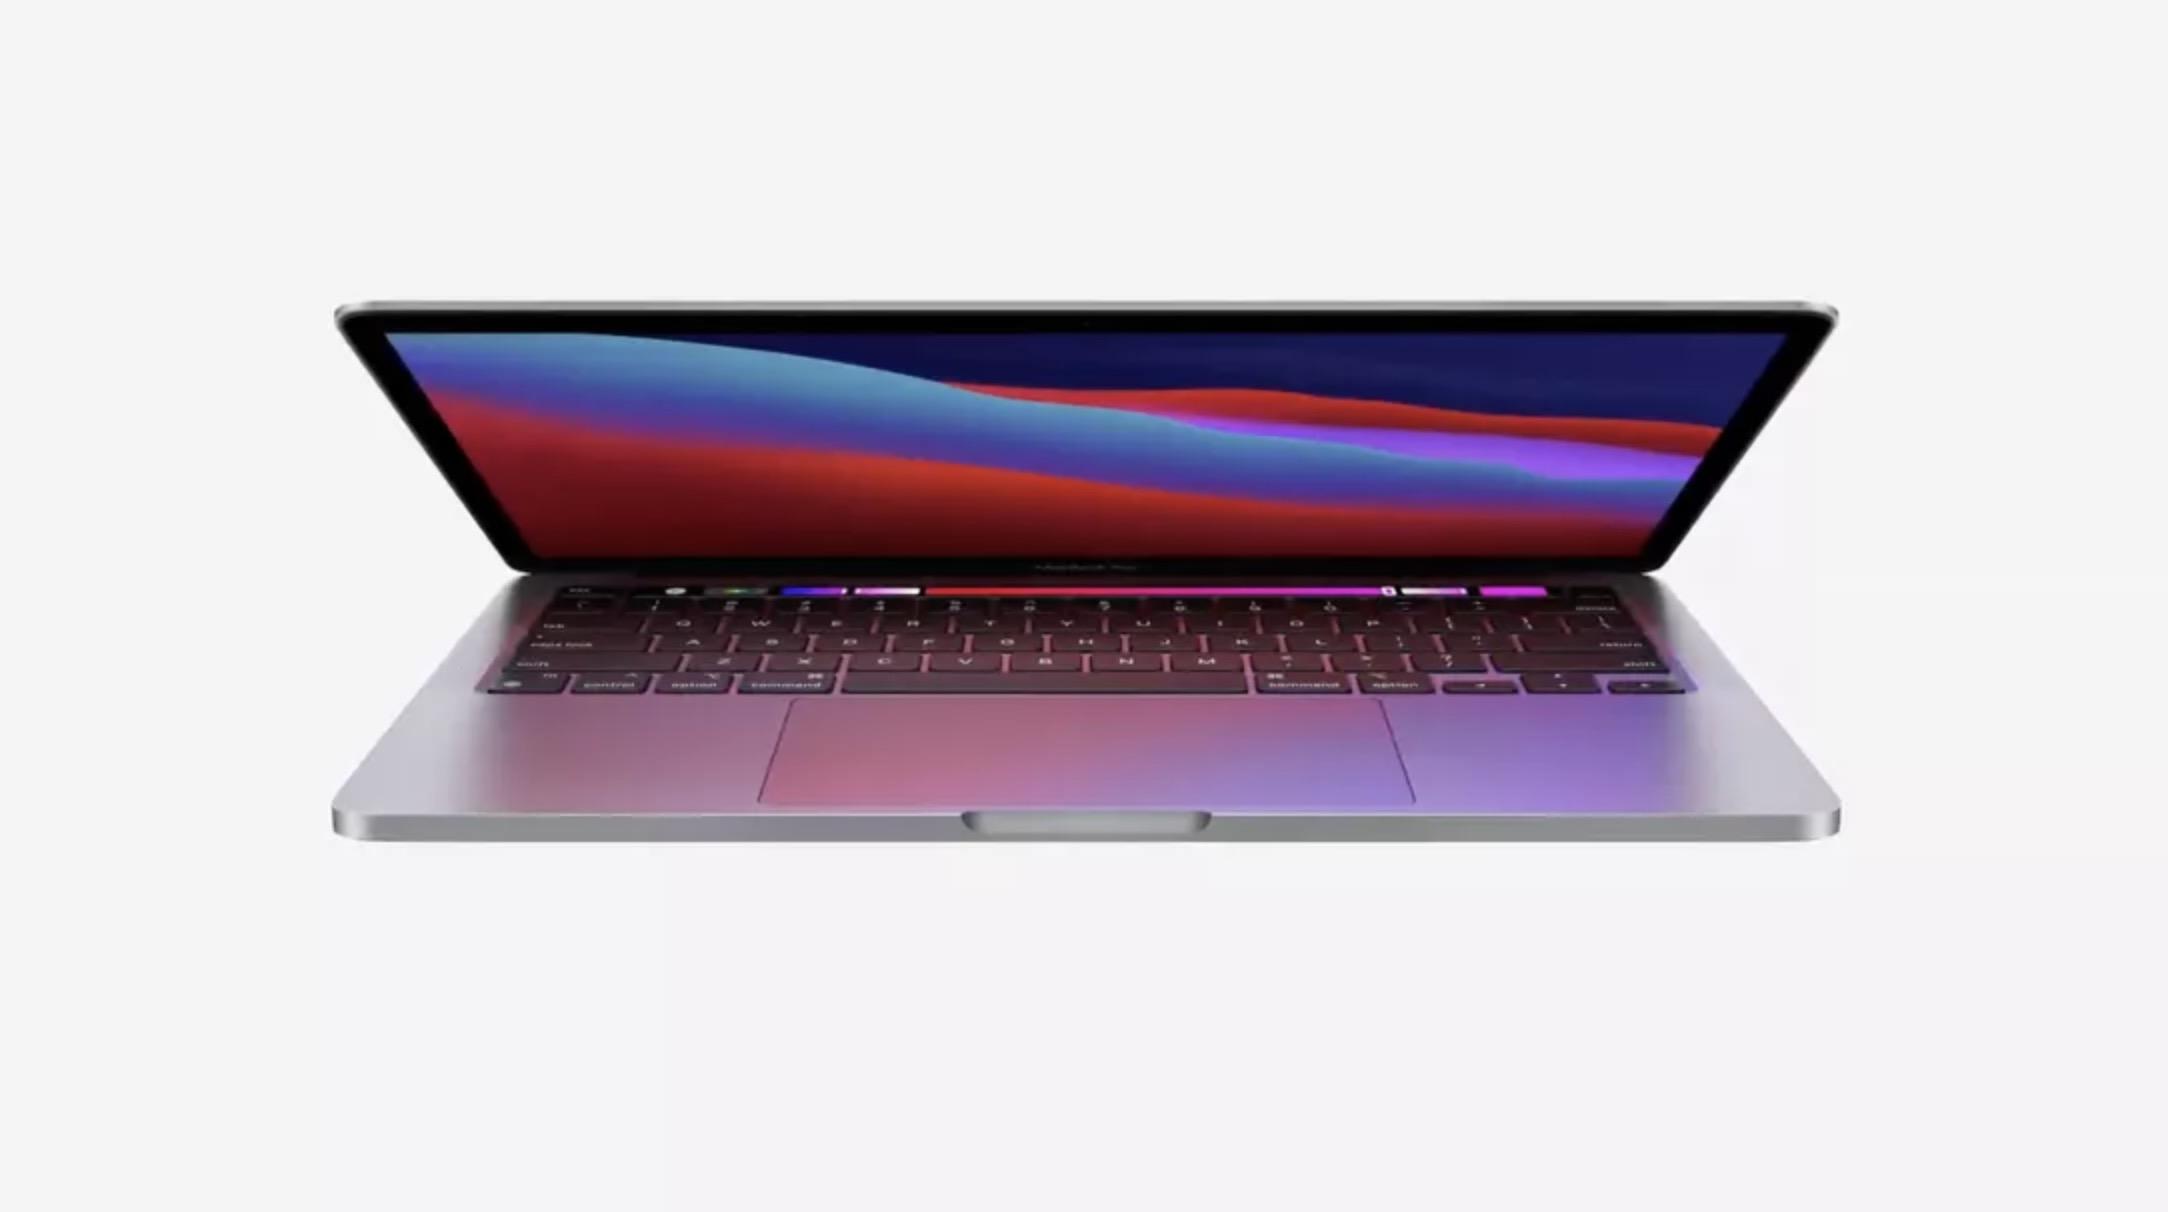 Yeni macbook 2021